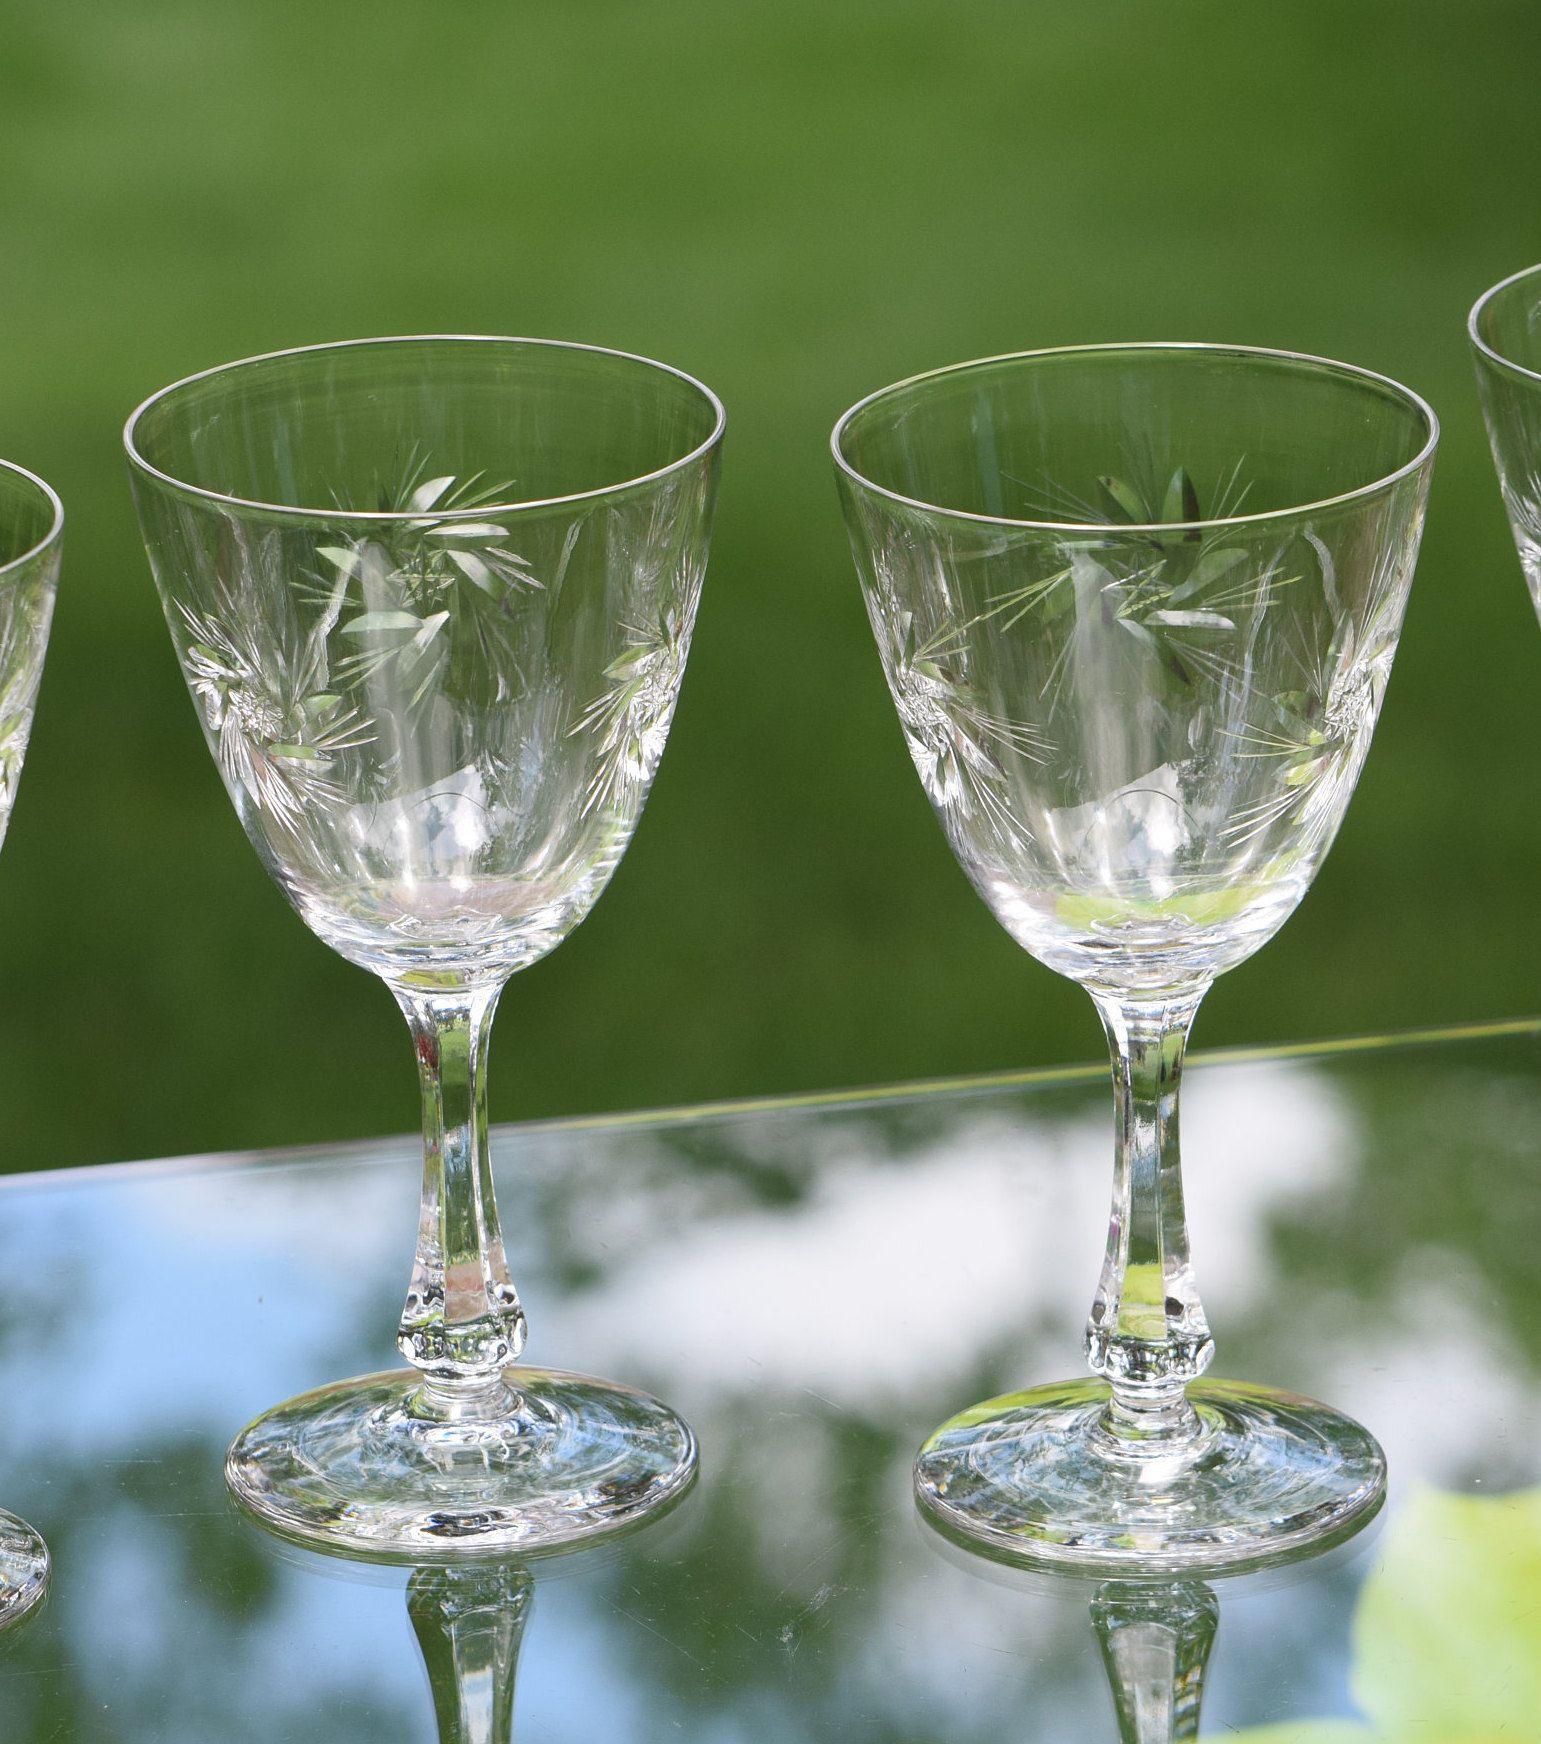 Vintage Crystal Etched Starburst Wine Glasses Set Of 4 Vintage Etched Crystal Water Goblets Wine Party Gla Vintage Crystal Crystal Wine Glasses Wine Parties